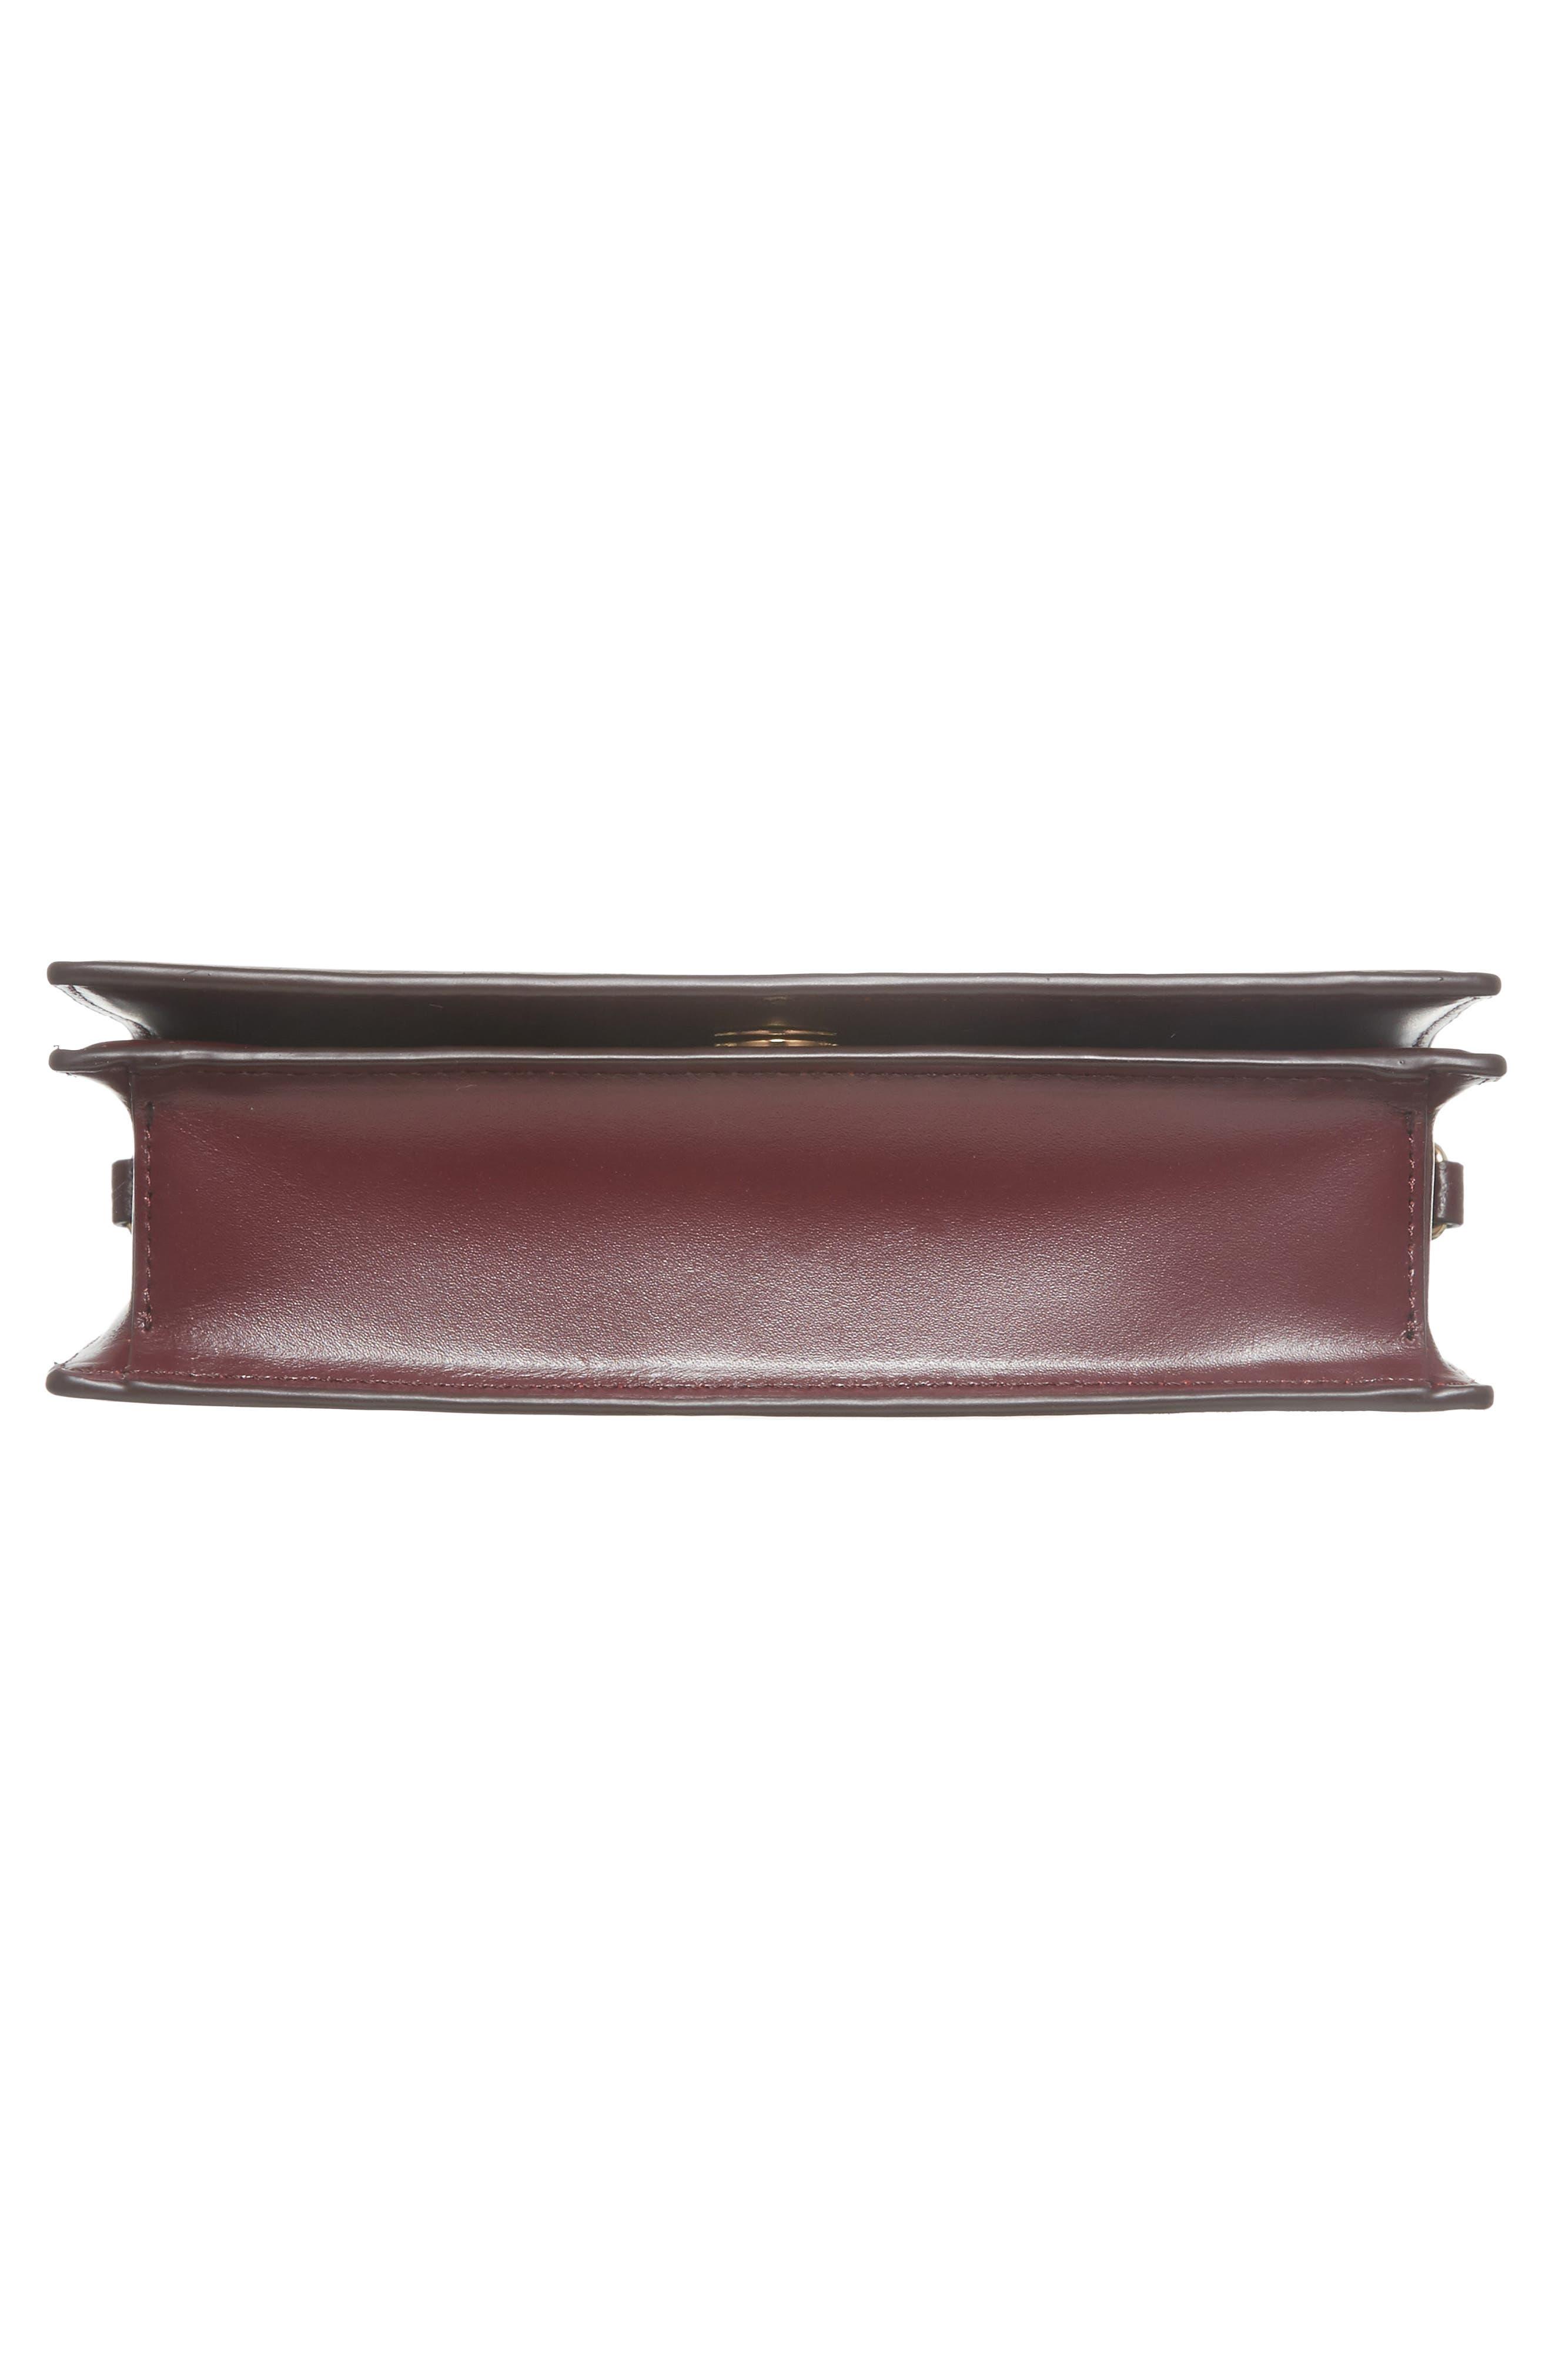 Soirée Leather Convertible Crossbody Bag,                             Alternate thumbnail 21, color,